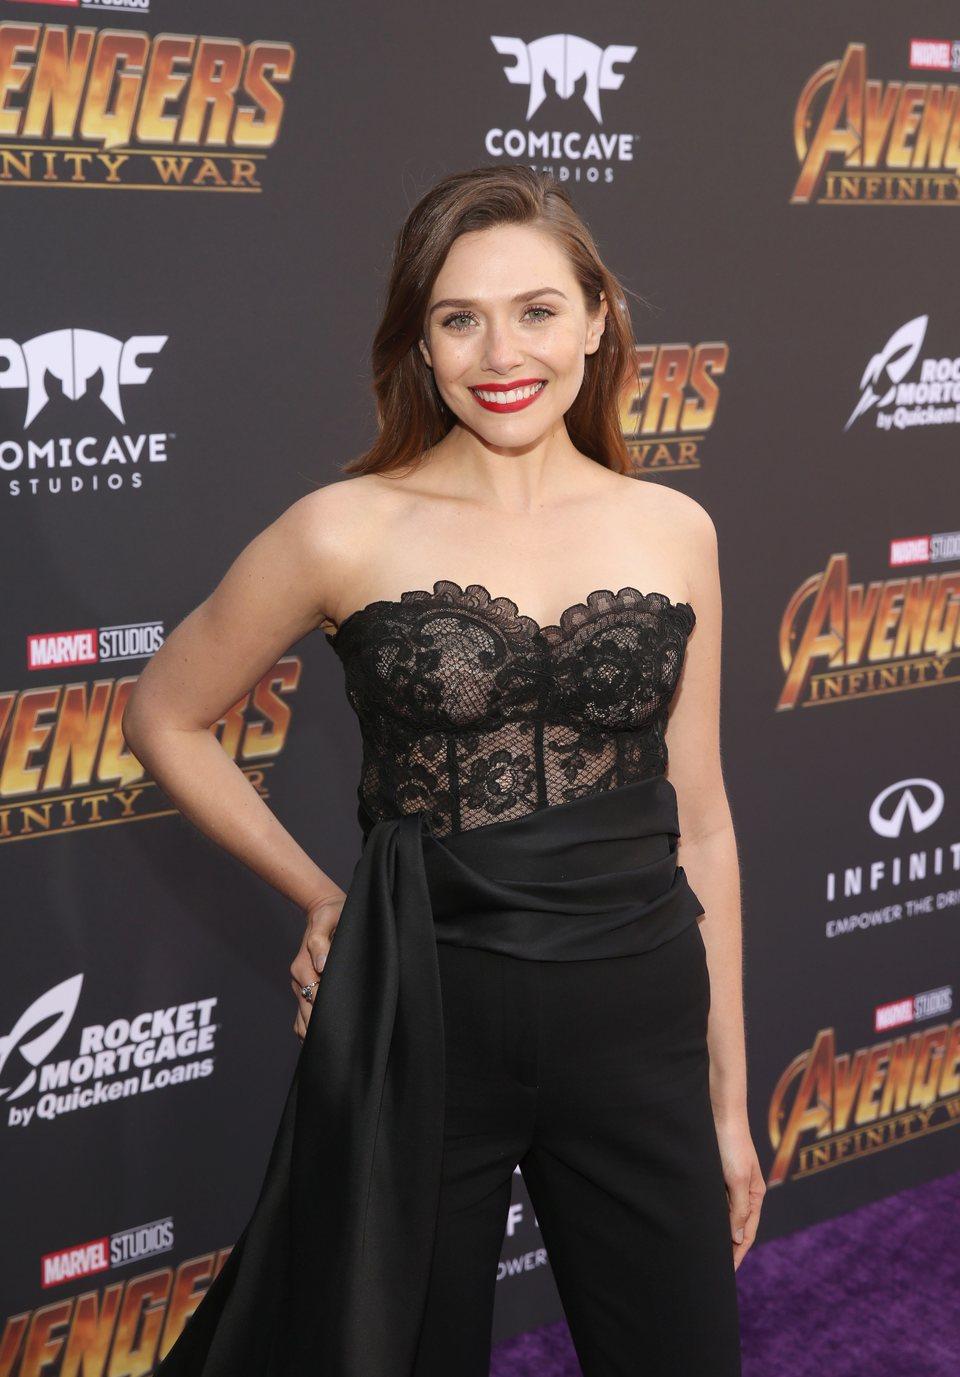 Elizabeth Olsen poses on the purple carpet at the world premiere of 'Avengers: Infinity War'